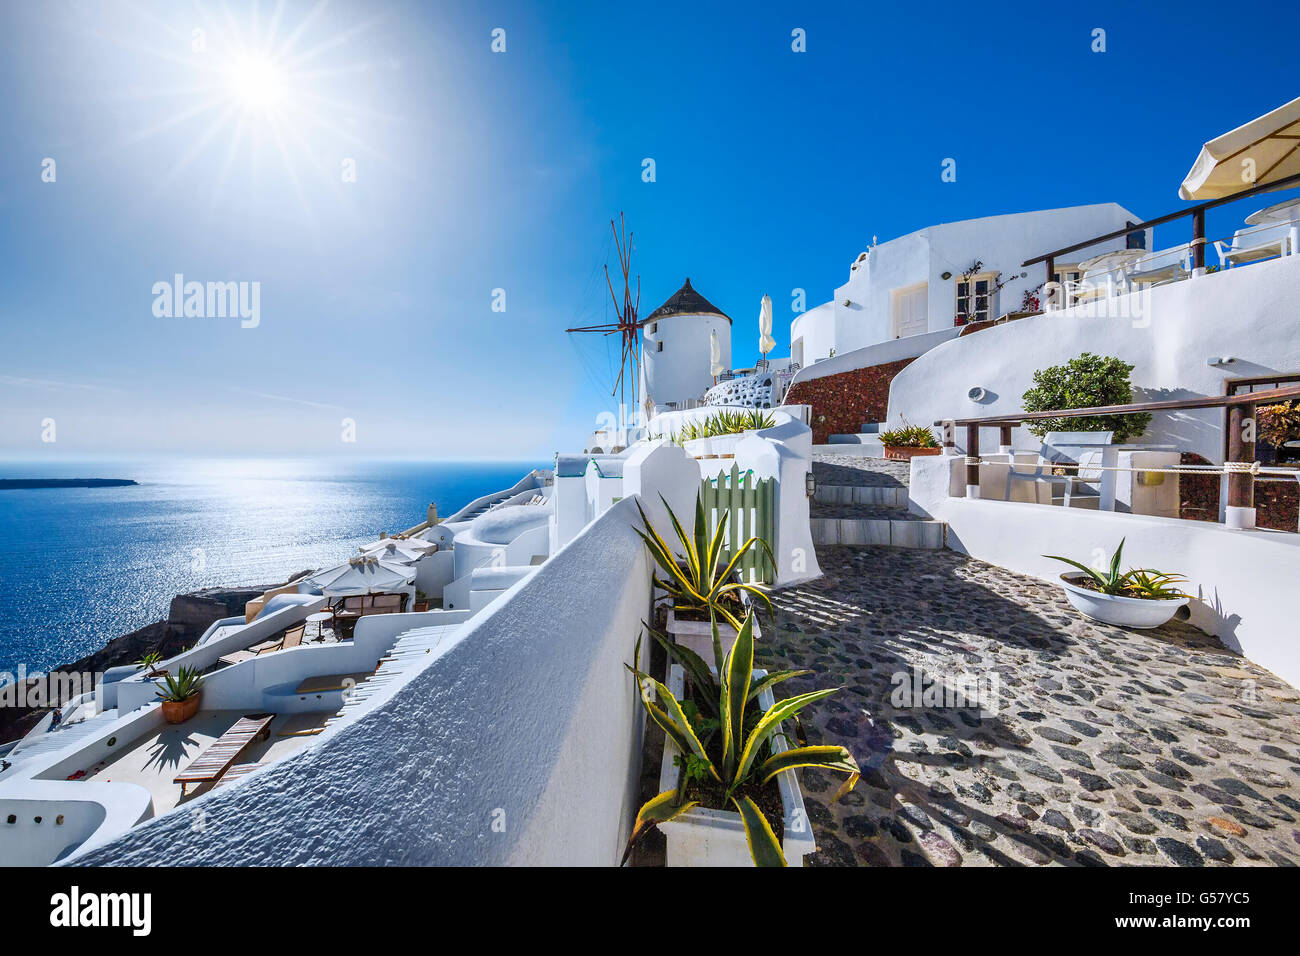 Oia village with sun, Santorini island, Greece - Stock Image